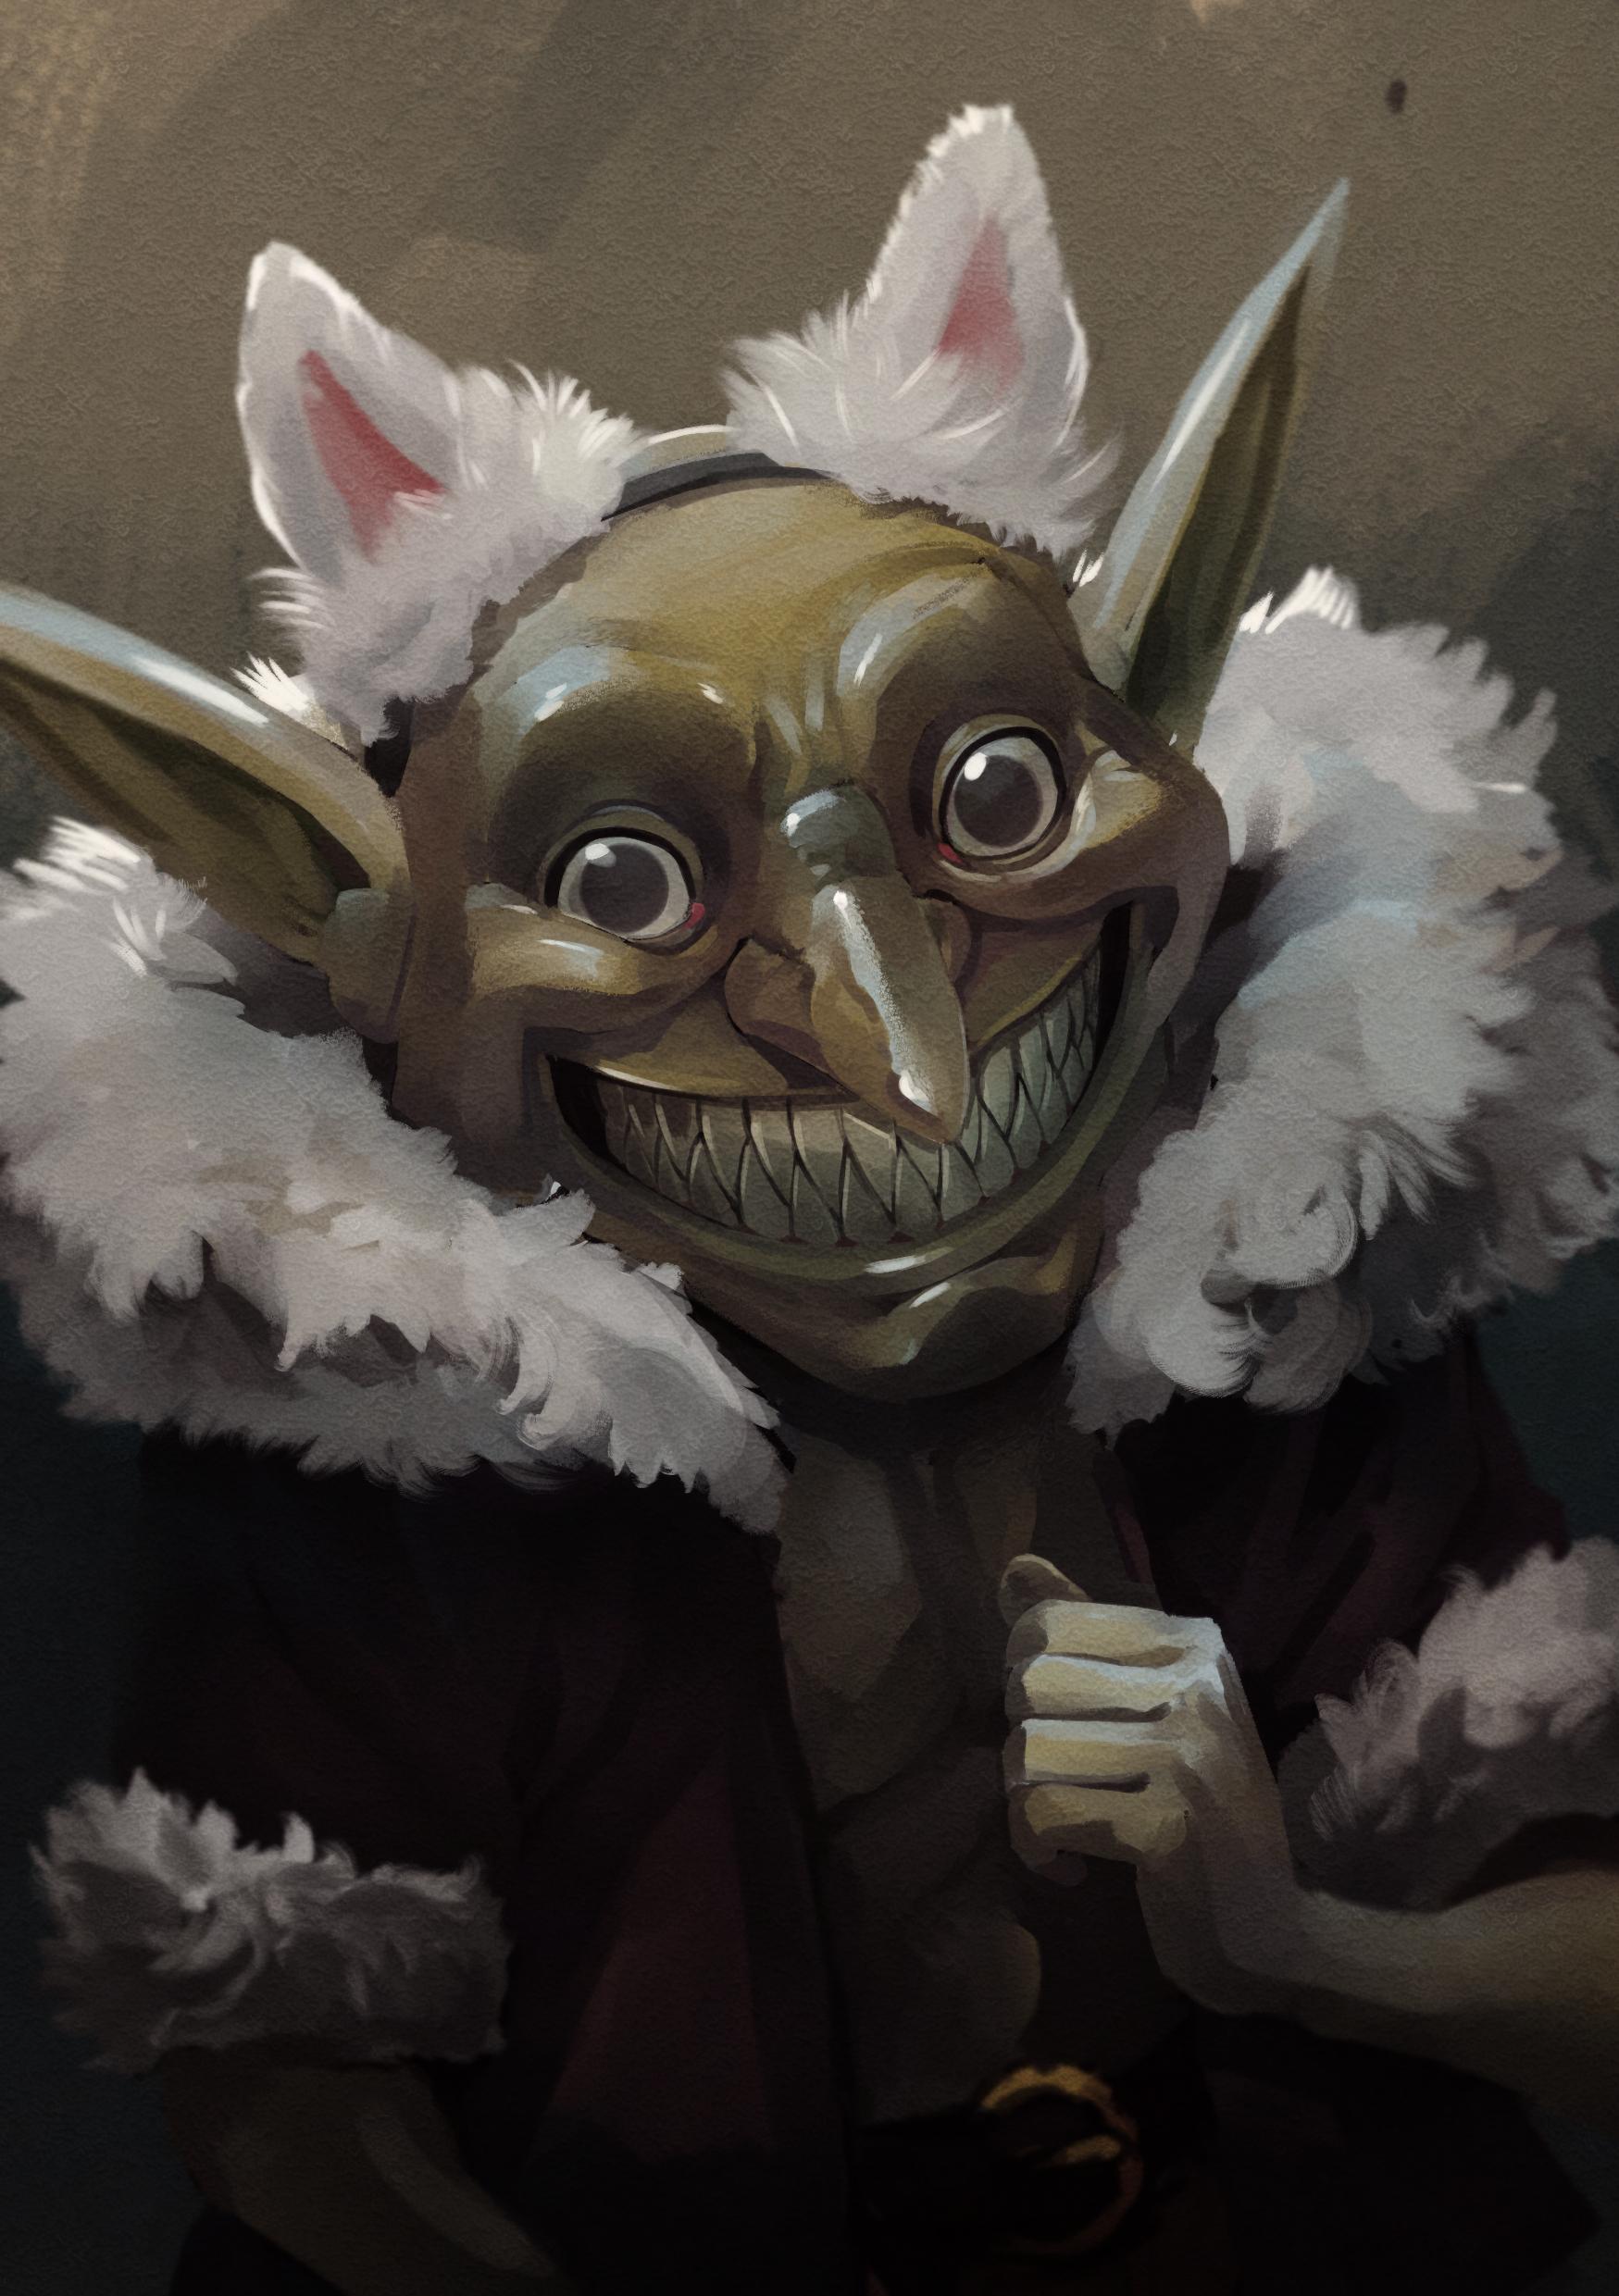 Goblin the Pupper